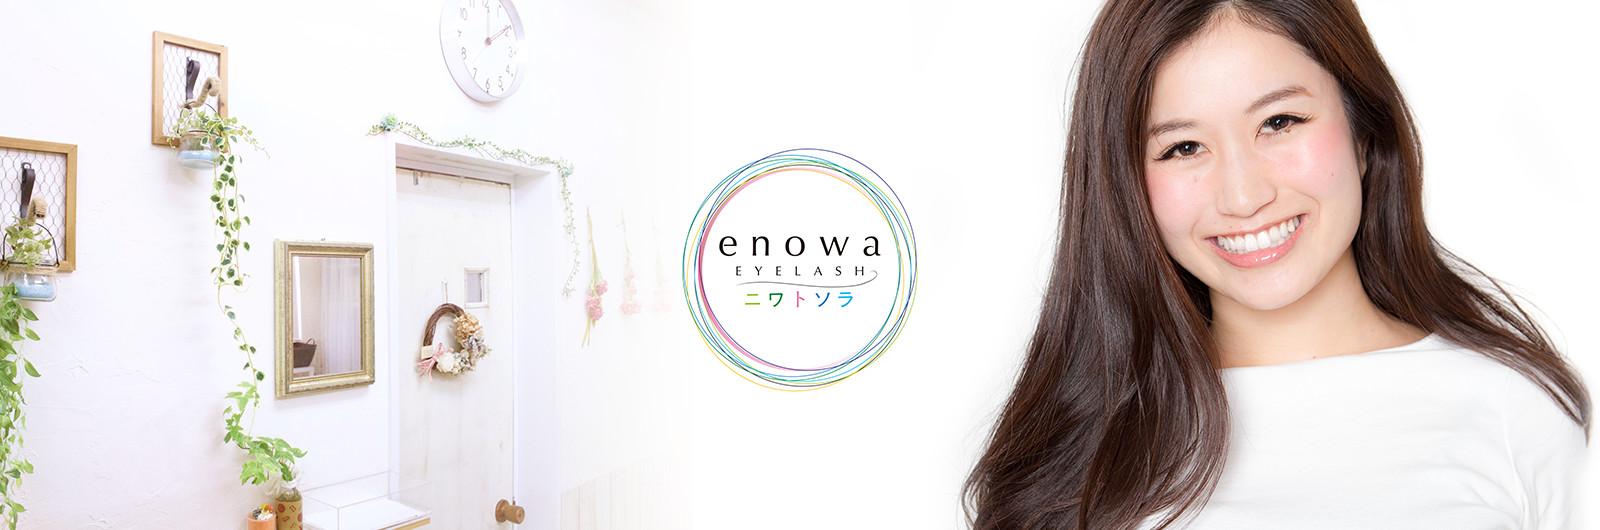 enowa eyelash ニワトソラ 浦和東口店